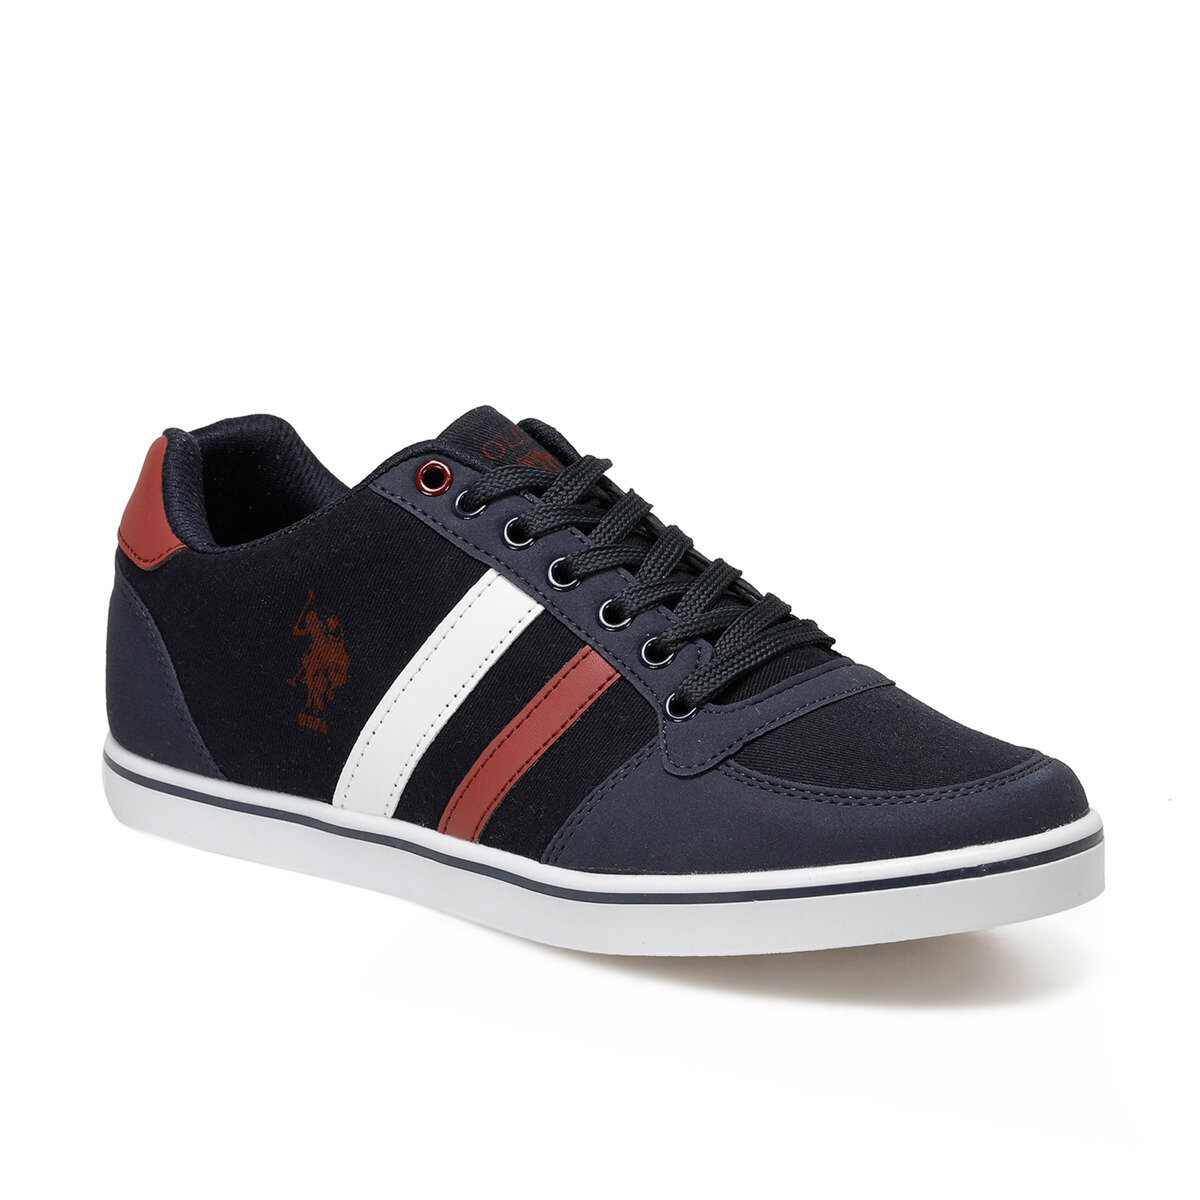 FLO Navy Blue Men Sneaker Shoes For Men Summer Men Sneakers Lace Up Low Top Footwear Breathable Sport Trainers Zapatillas Hombre U.S. POLO ASSN. REGGIE